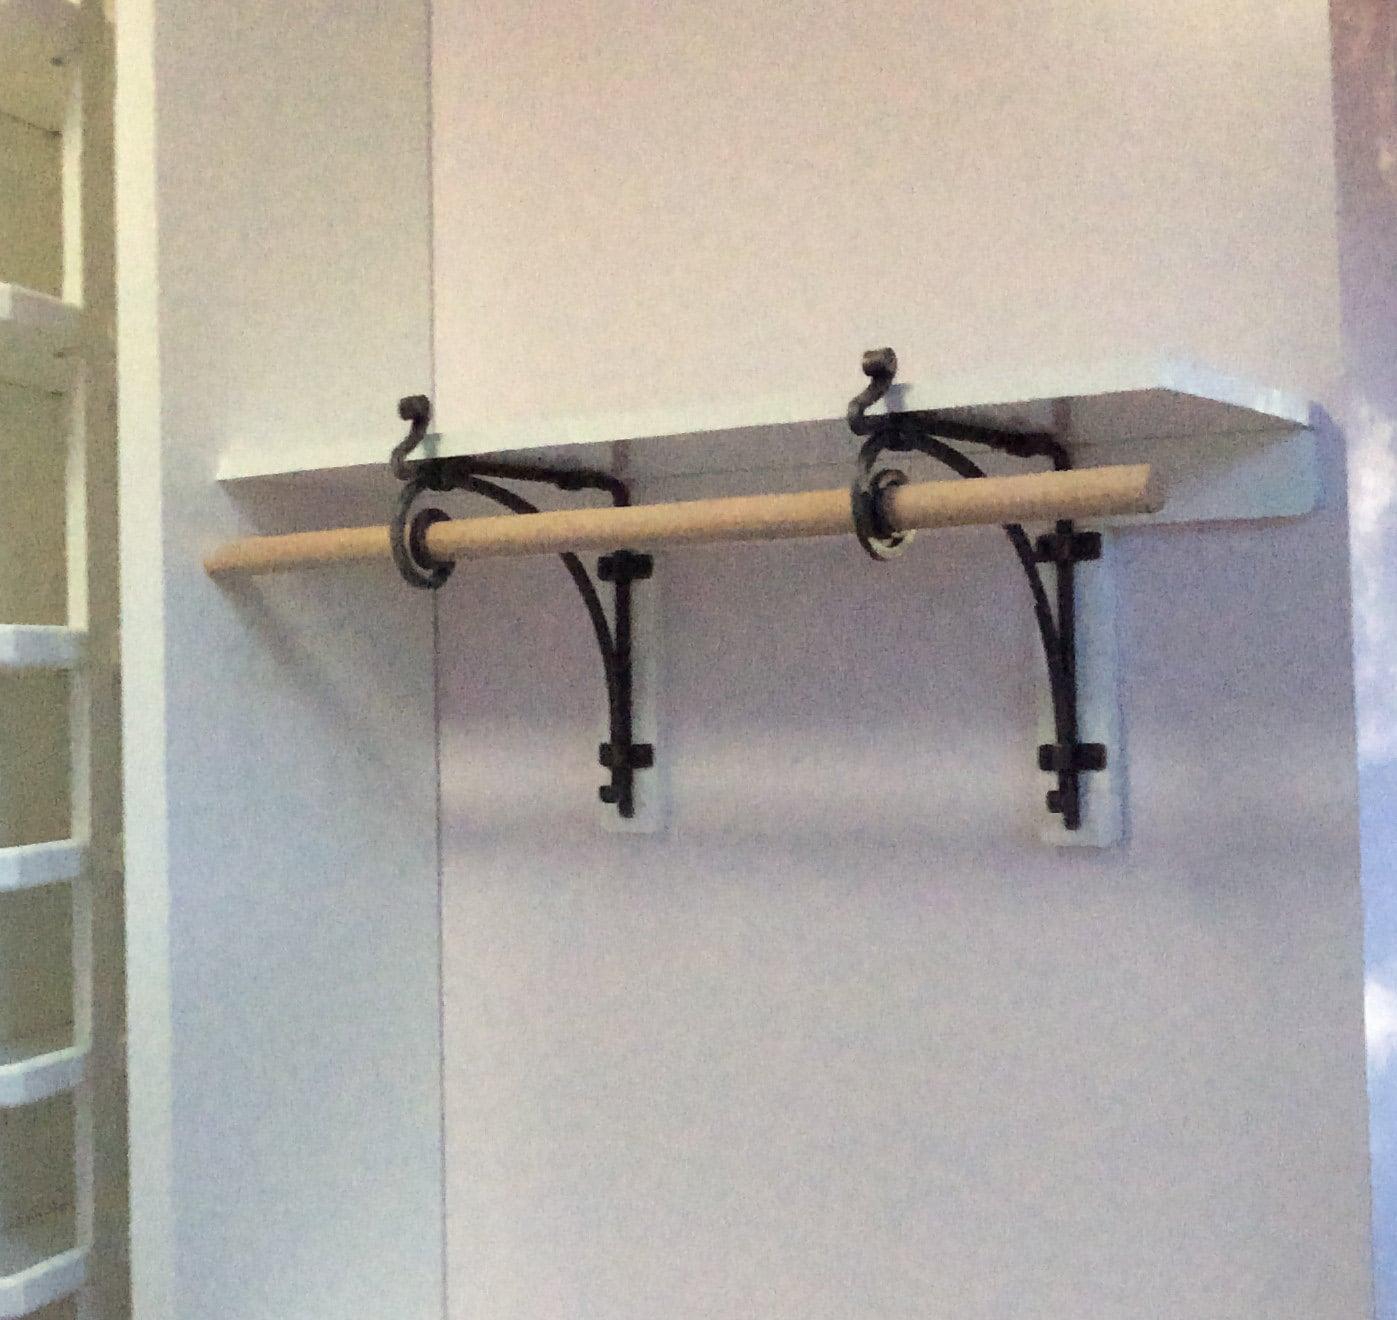 Metal Iron Hand Forged Shelf Bracket Corbel With Rod Steel